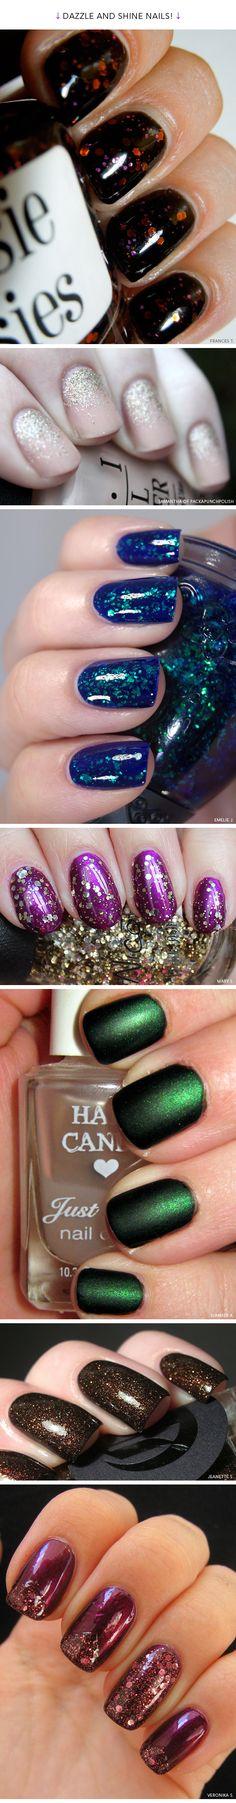 7 Dazzling Holiday Manicure Ideas